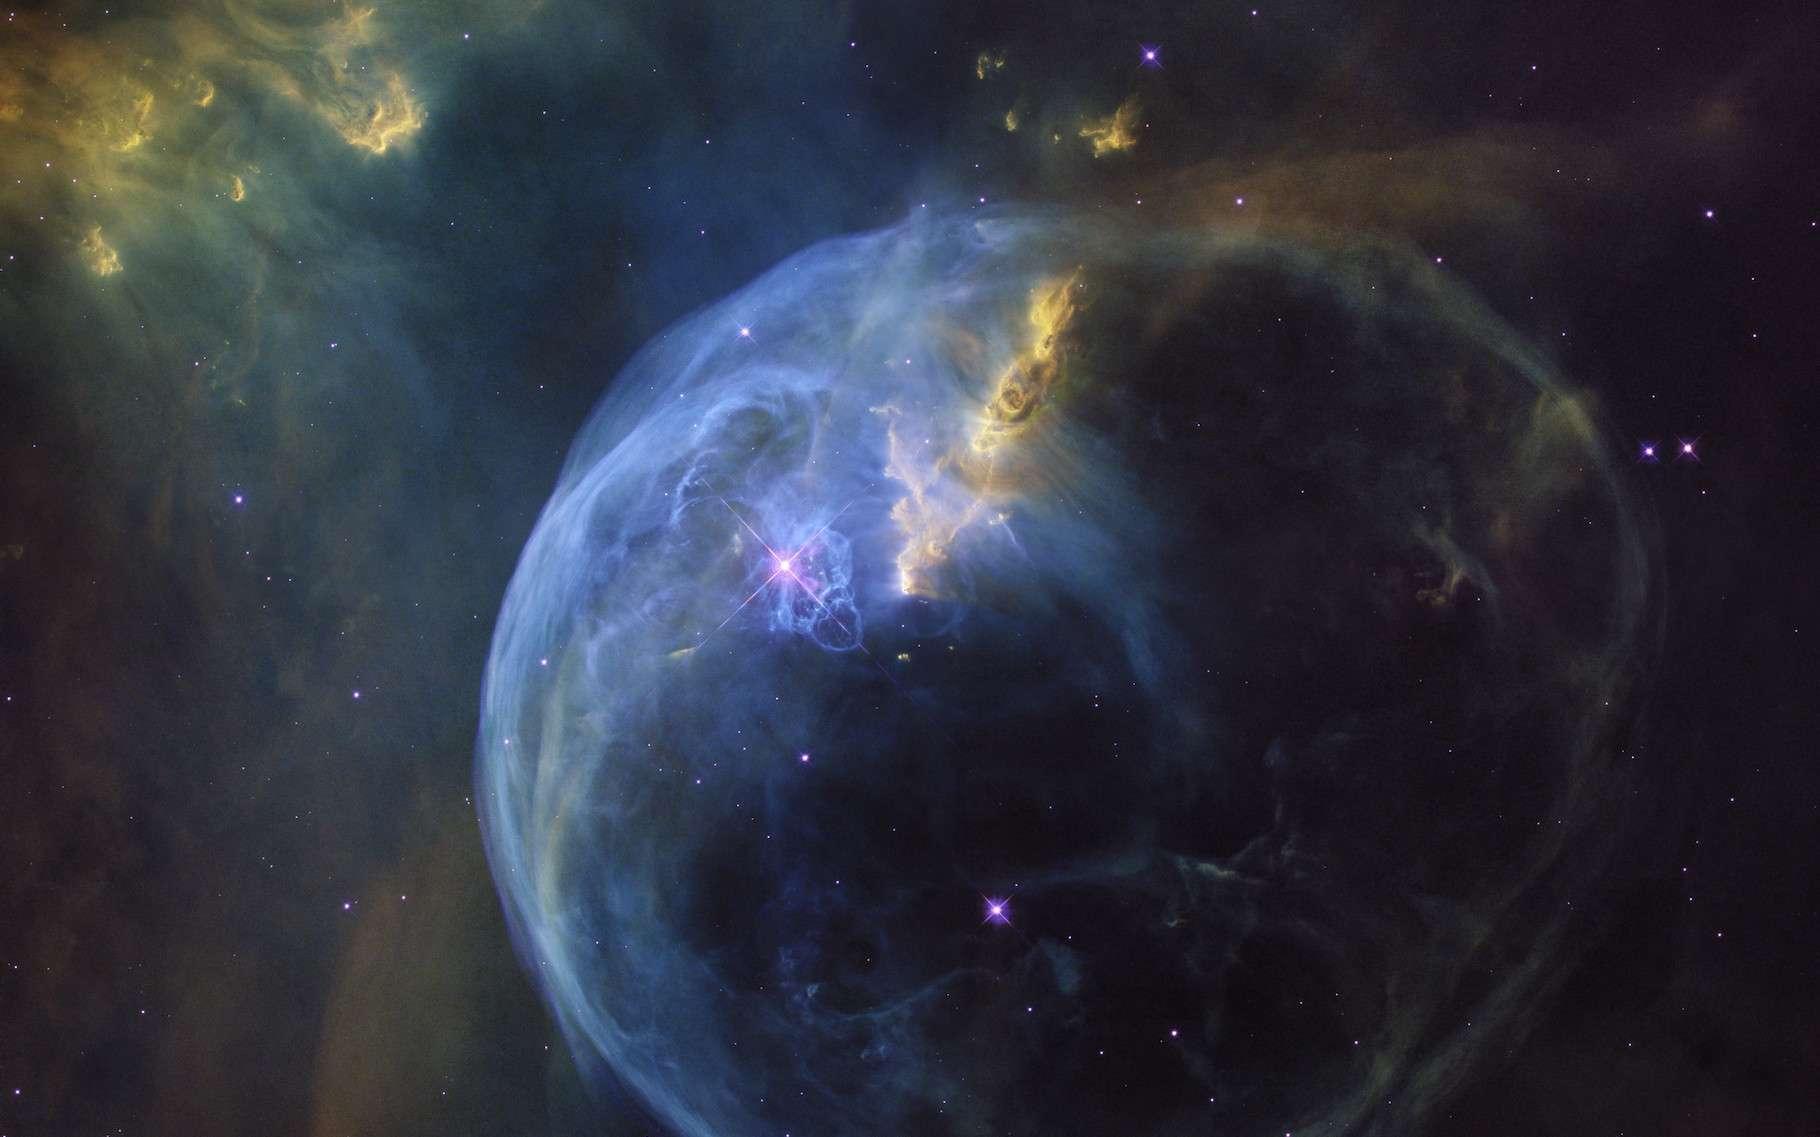 La nébuleuse de la Bulle, dans la constellation de Cassiopée. © Nasa, ESA, Hubble Heritage Team